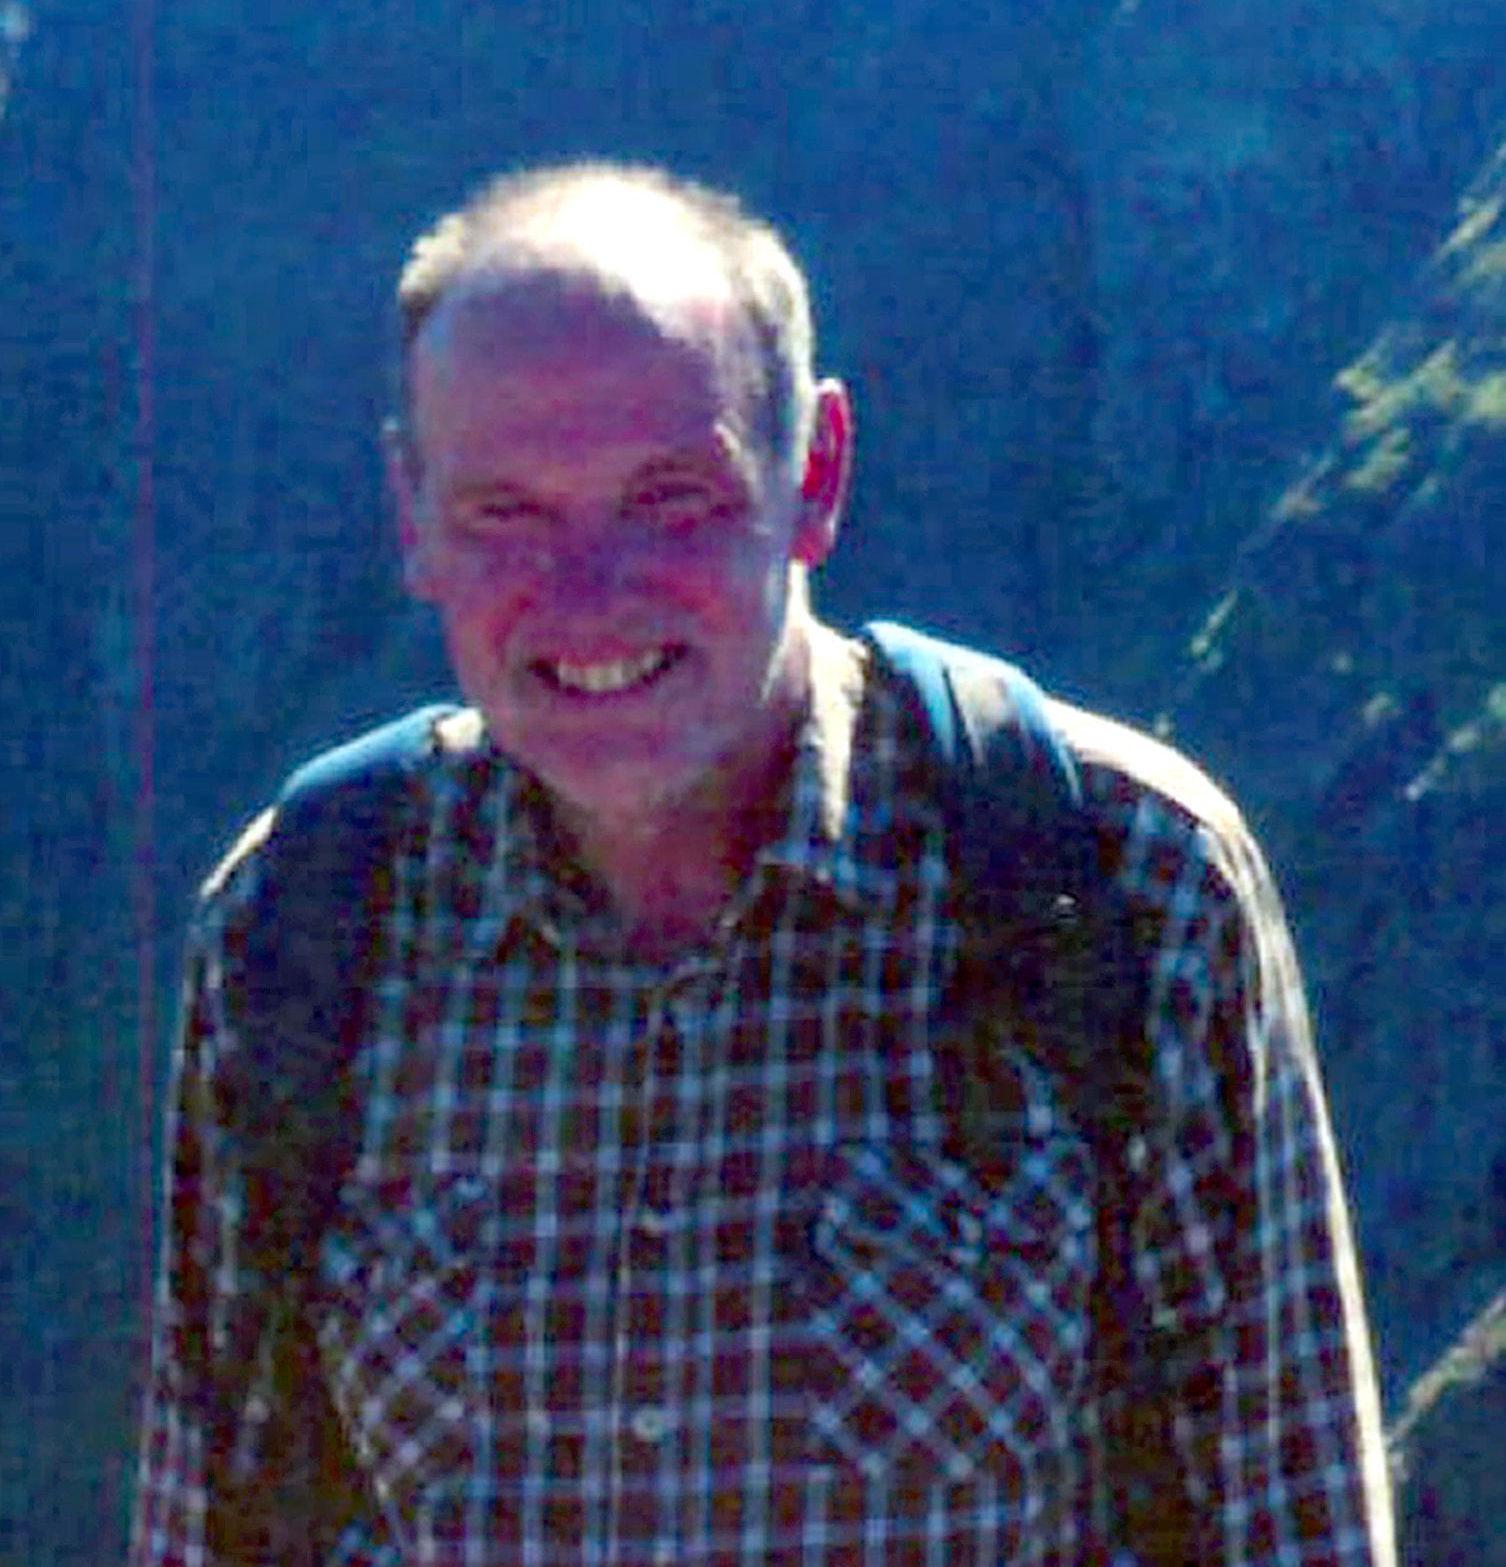 Neil Gibson, 63, is still missing.